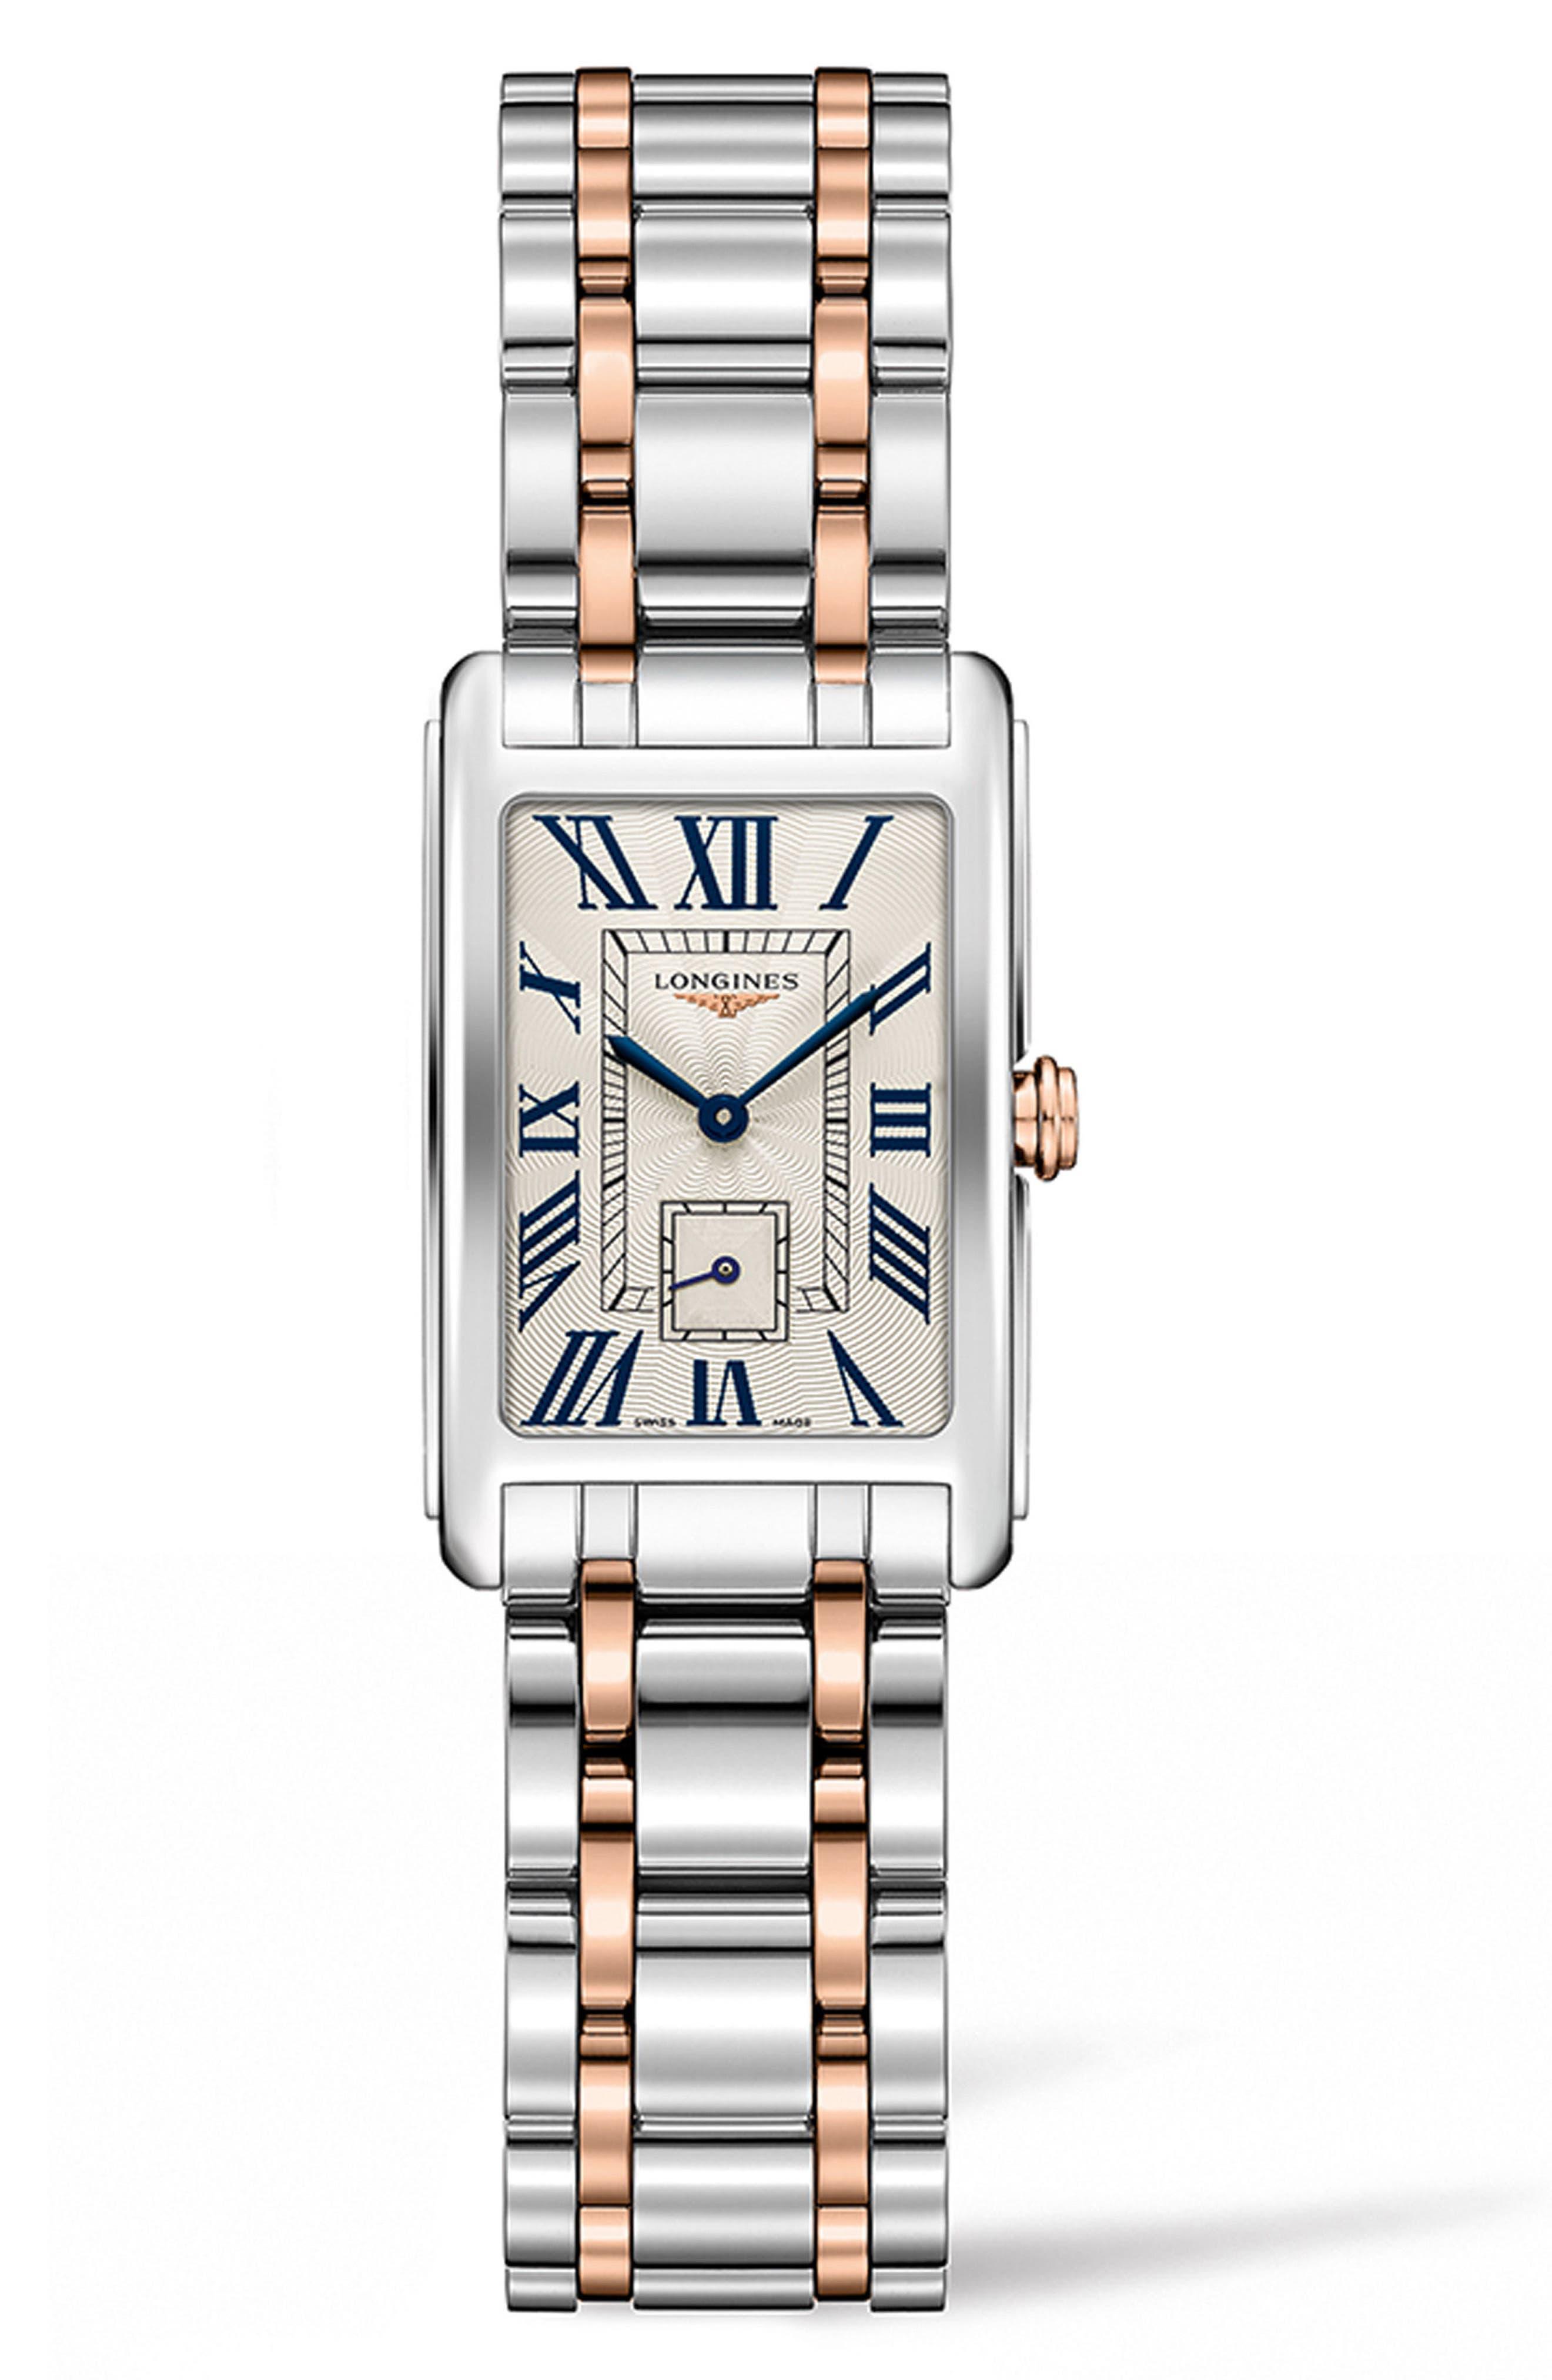 Main Image - Longines DolceVita Bracelet Watch, 20.5mm x 32mm